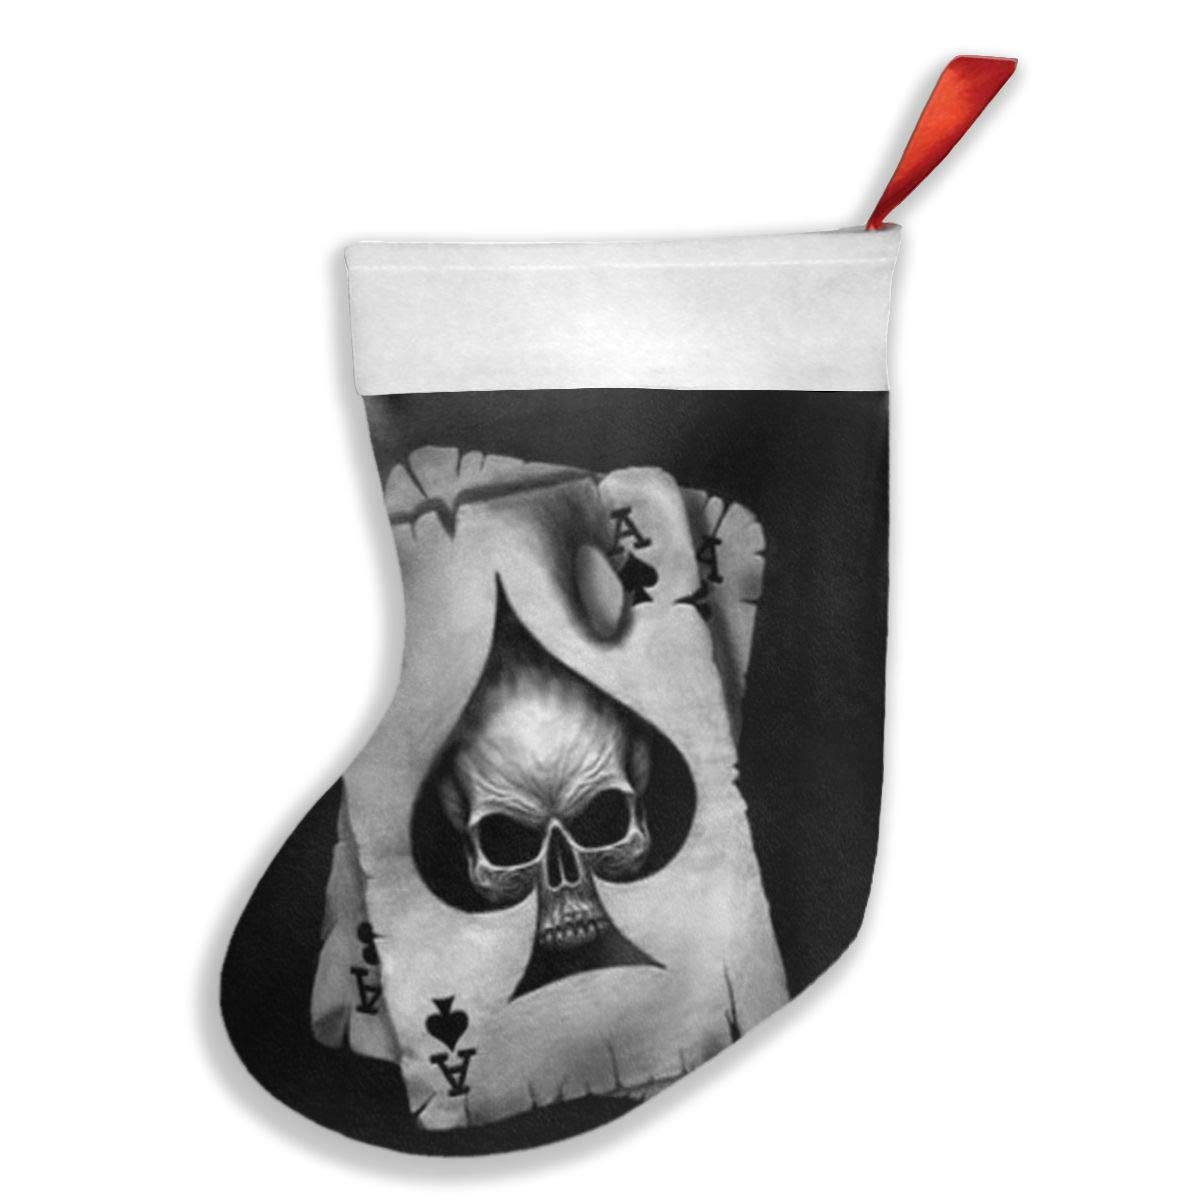 PO1 UP Monster Skull Stylish Christmas Holiday Stockings